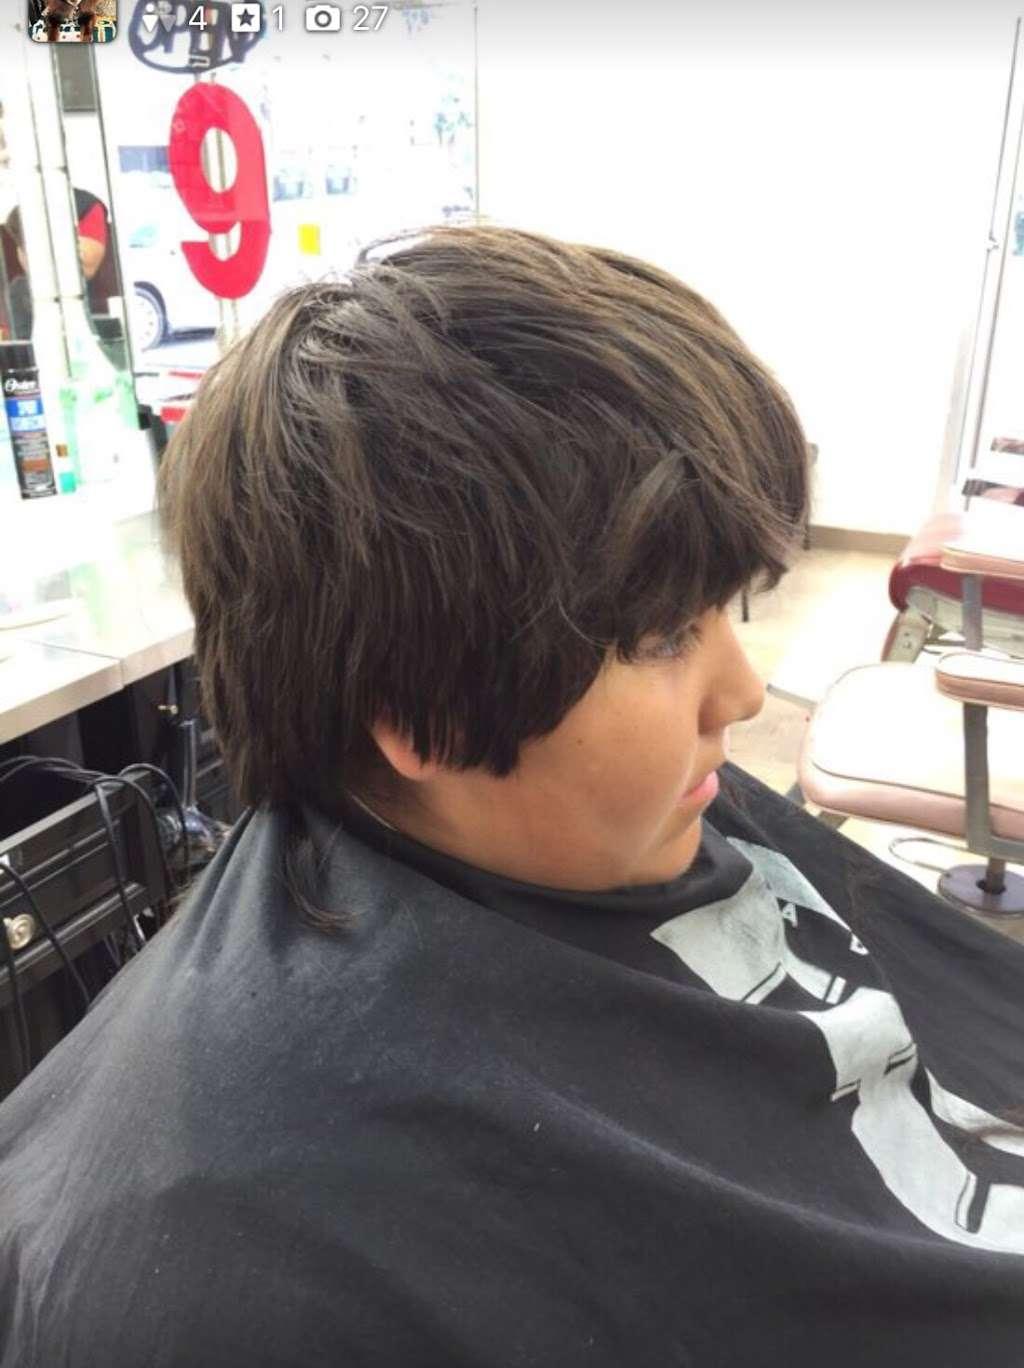 La Mesa Barber Shop - hair care  | Photo 2 of 10 | Address: 8515 La Mesa Blvd, La Mesa, CA 91942, USA | Phone: (619) 908-9557